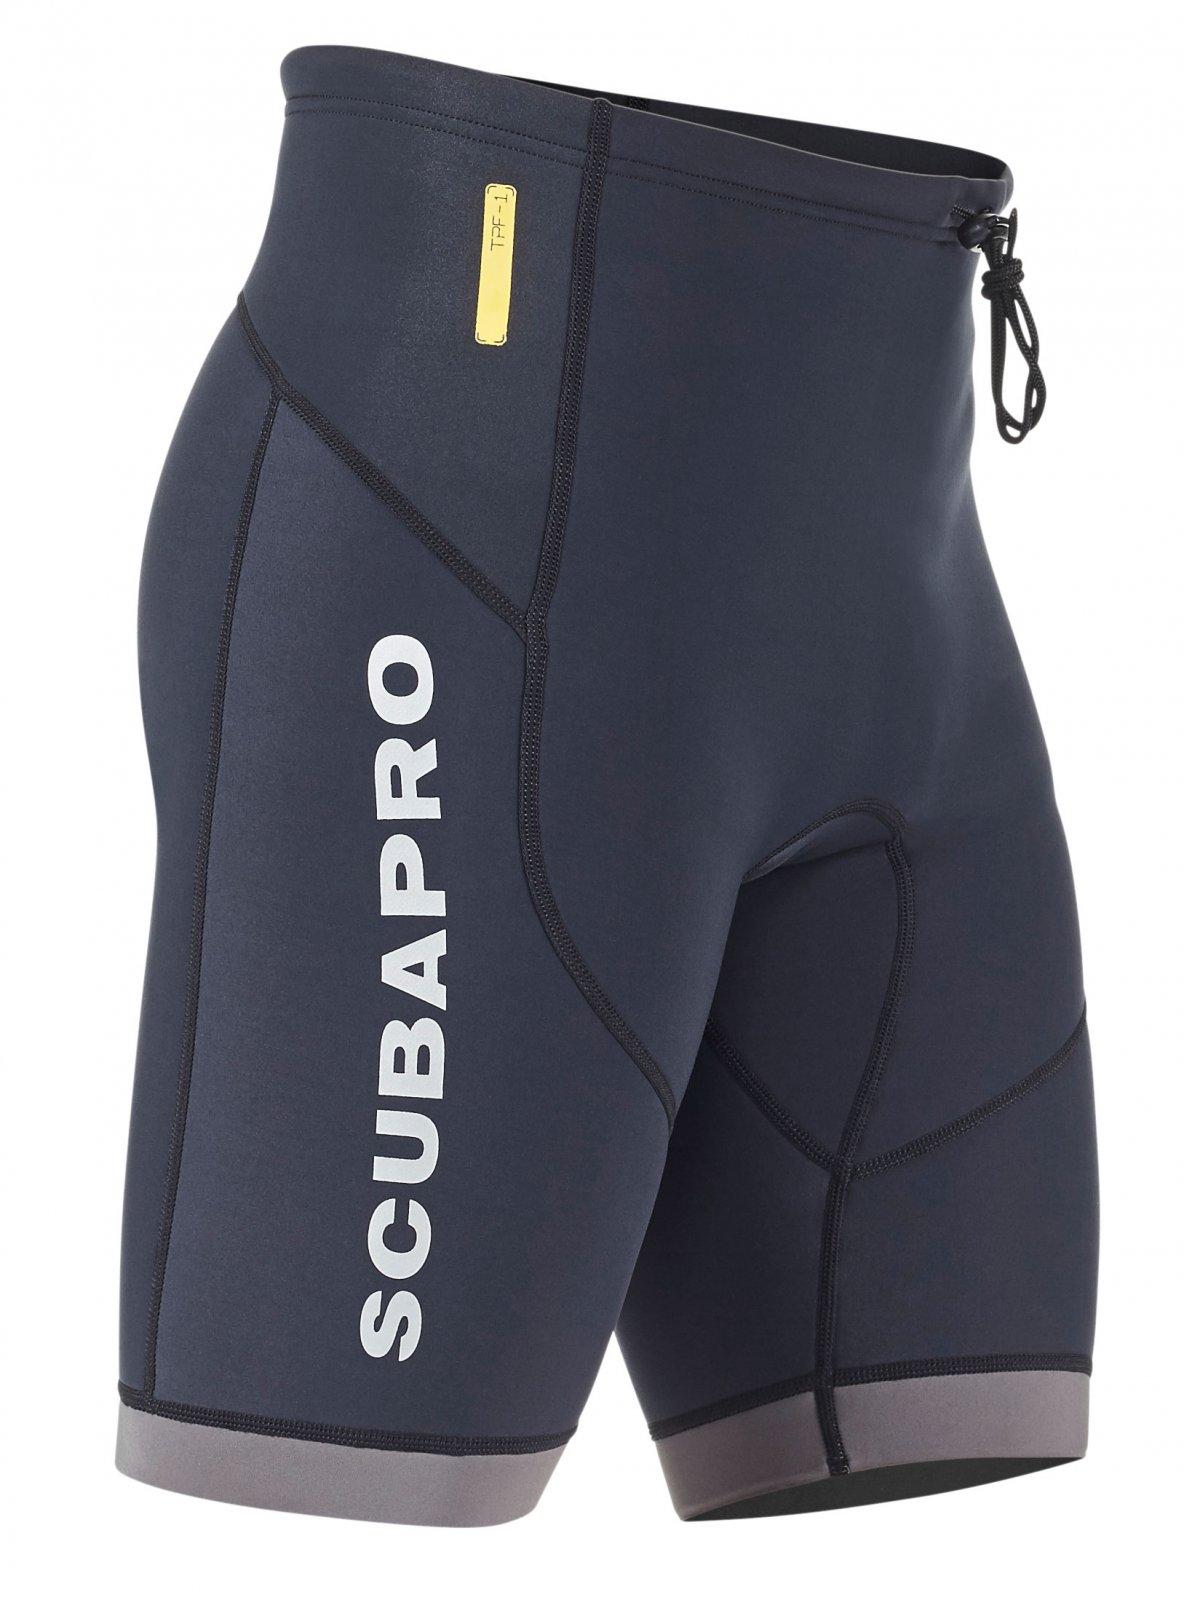 Scubapro Everflex 1.5 Short Men's